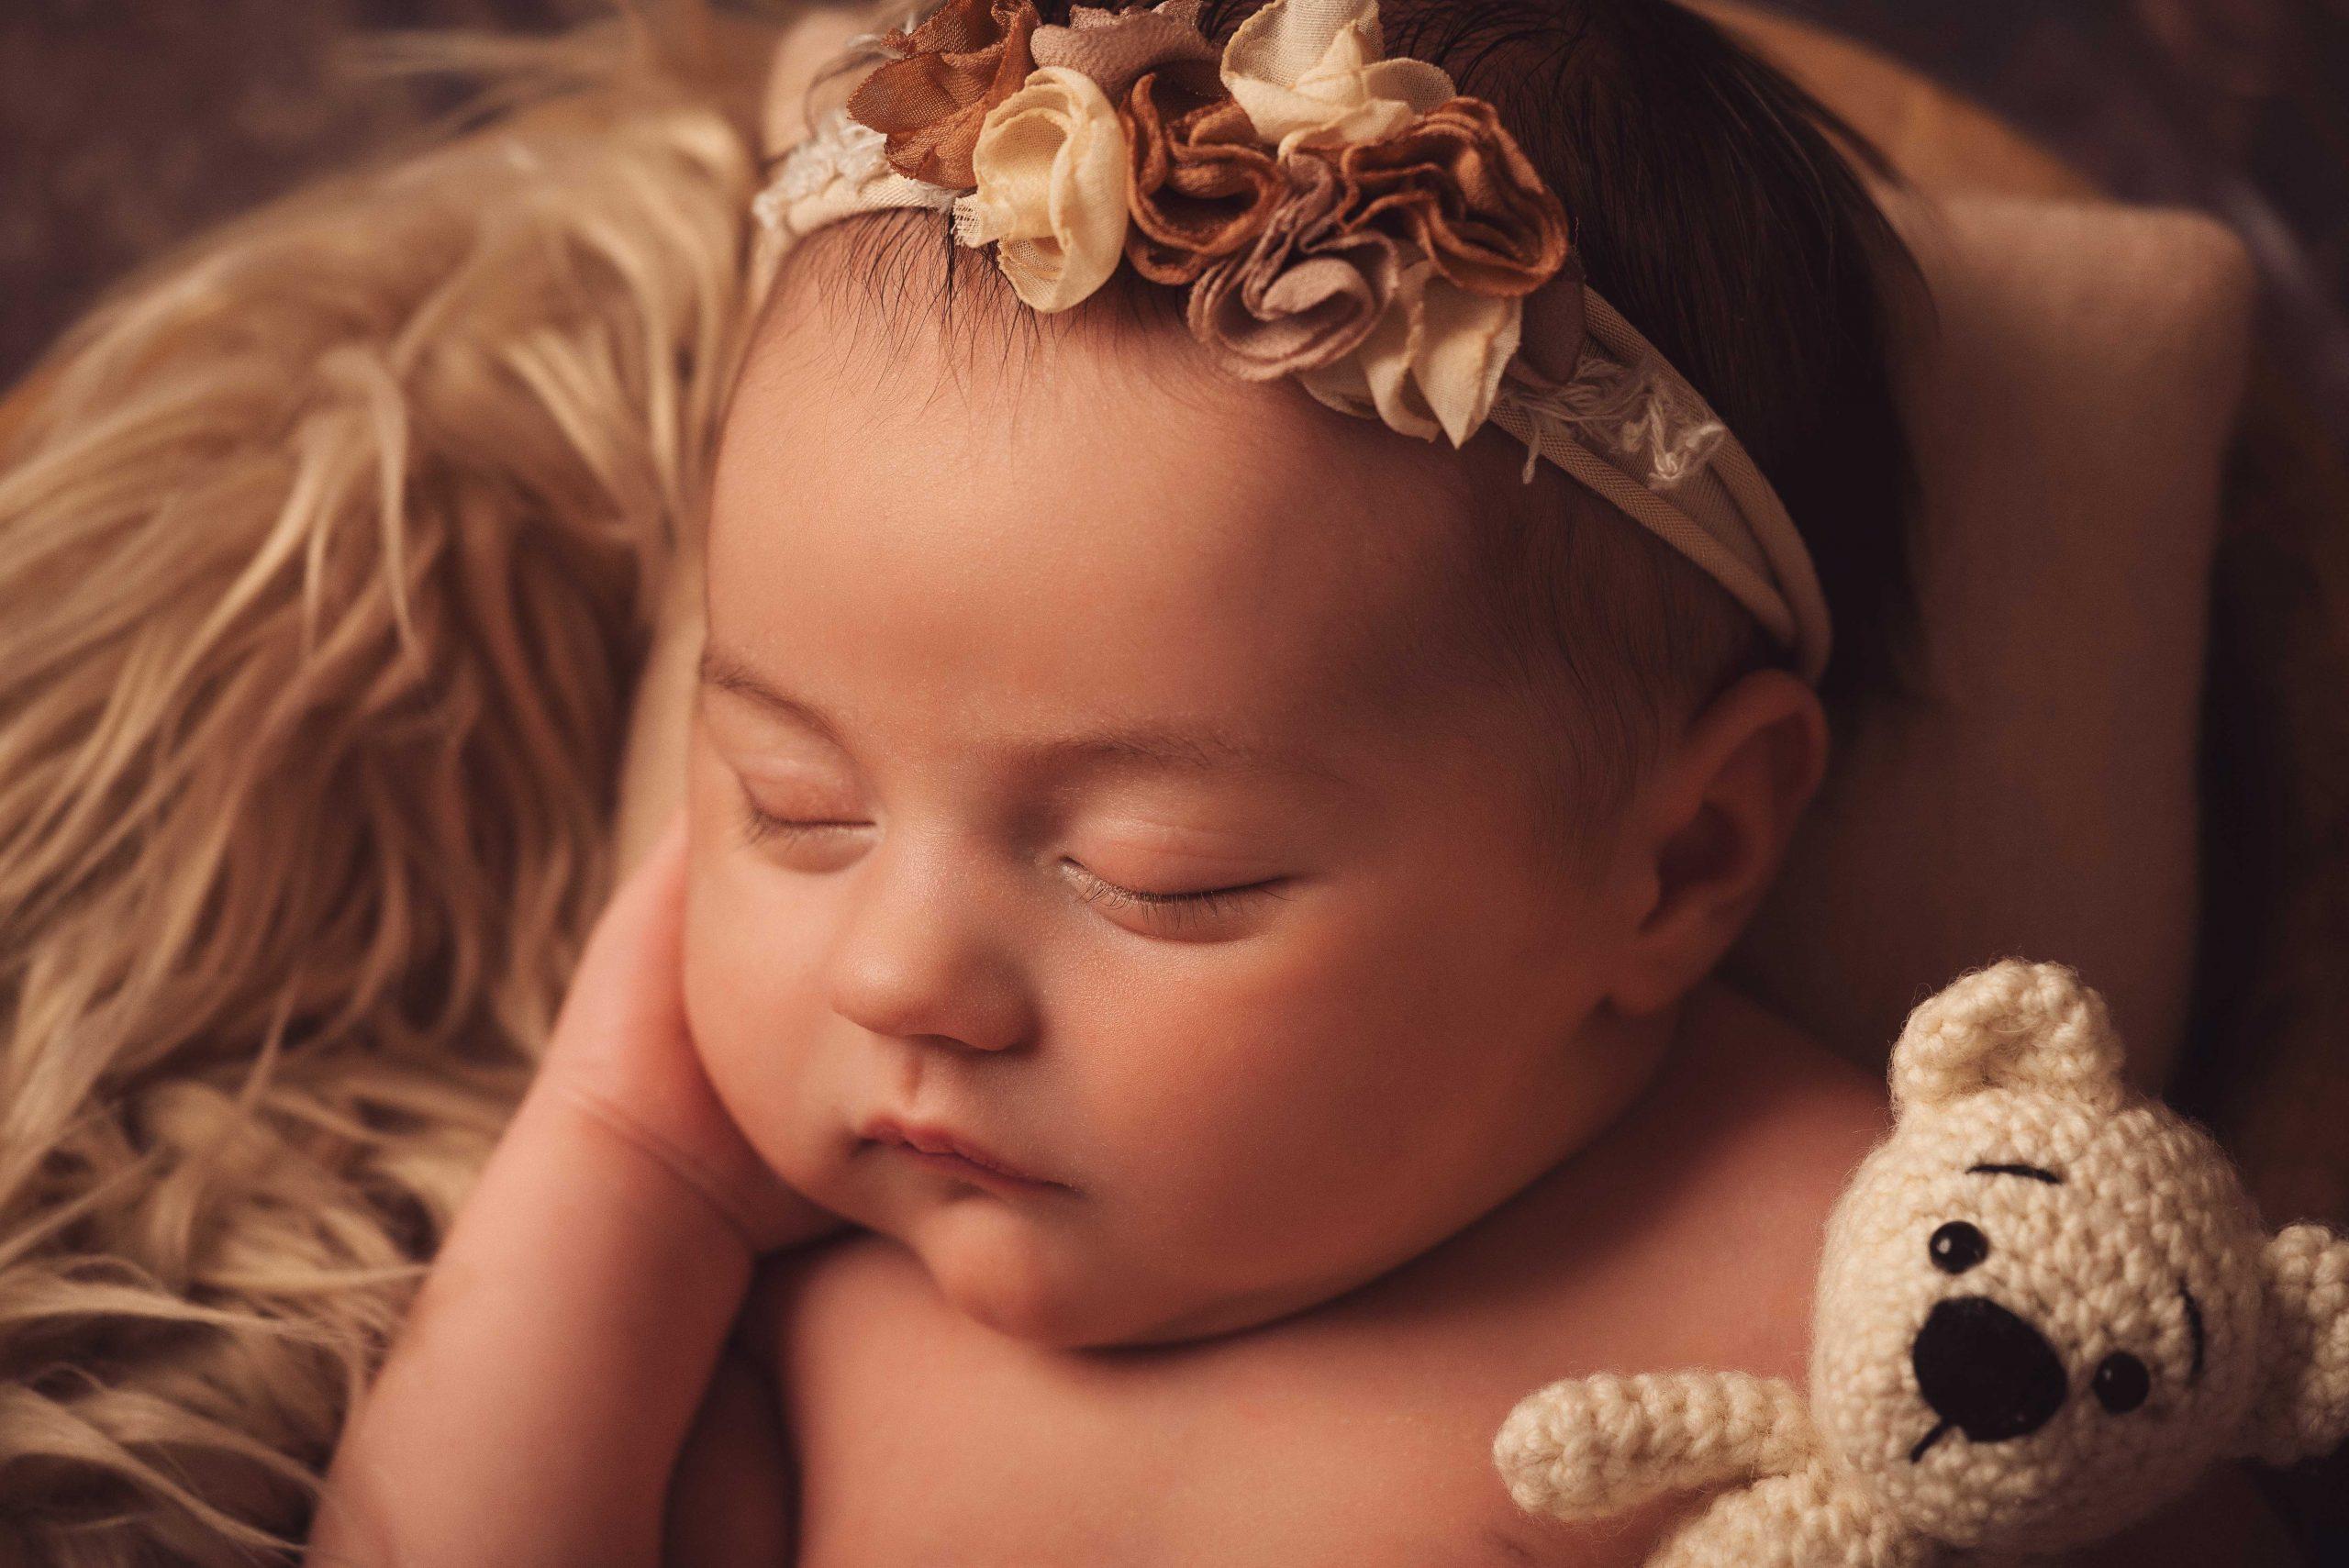 Amara | 18 Tage | Babyfotos & Familienfotografie im Fotostudio Koblenz